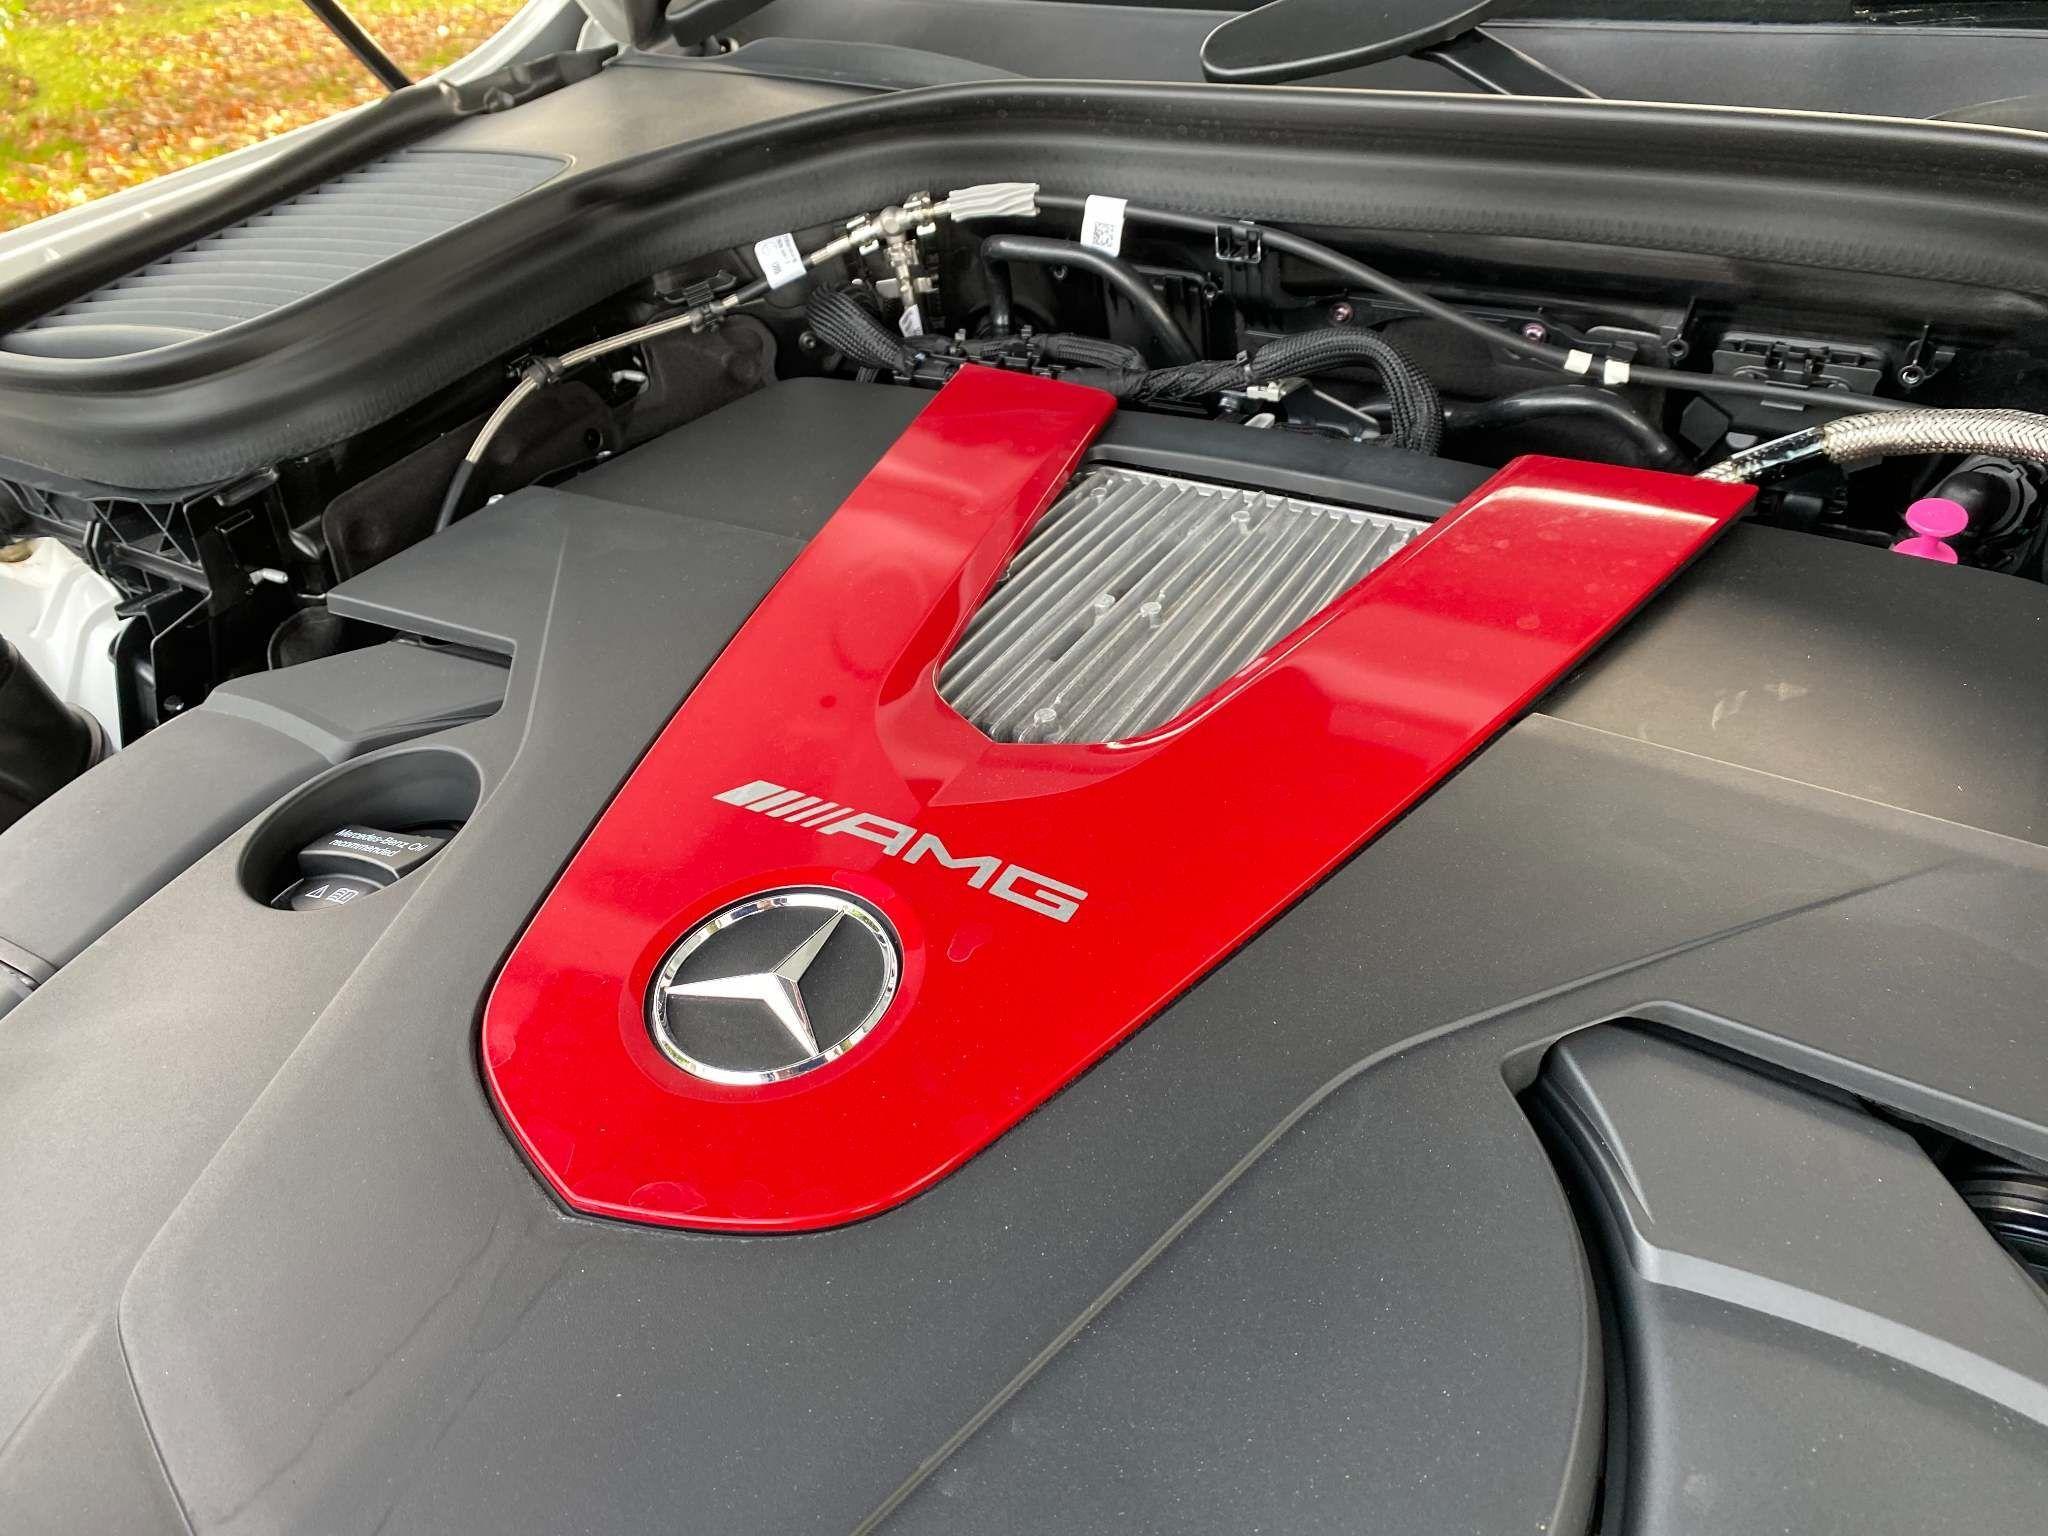 2019 Mercedes-Benz GLC Class 3.0 GLC43 V6 AMG (Premium) G-Tronic+ 4MATIC (s/s) 5dr Petrol Automatic – Moyway Motors Dungannon full